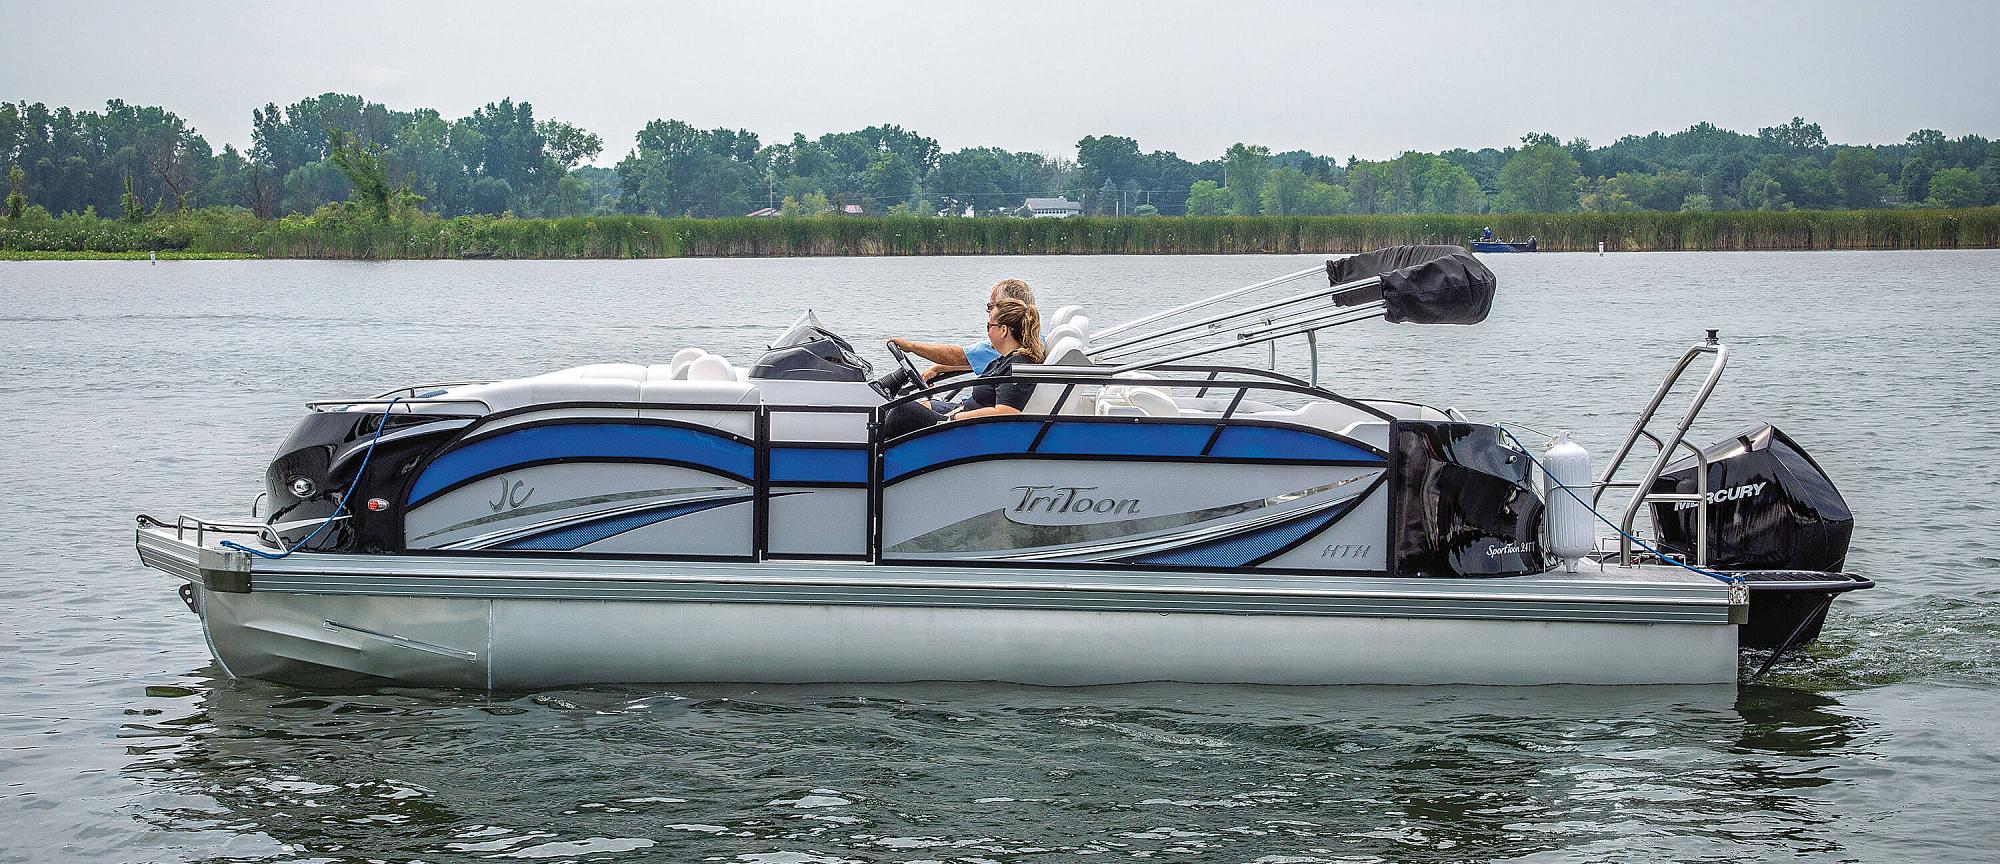 hight resolution of  2019 jc tritoon marine sporttoon 24tt hth pontoon boat side